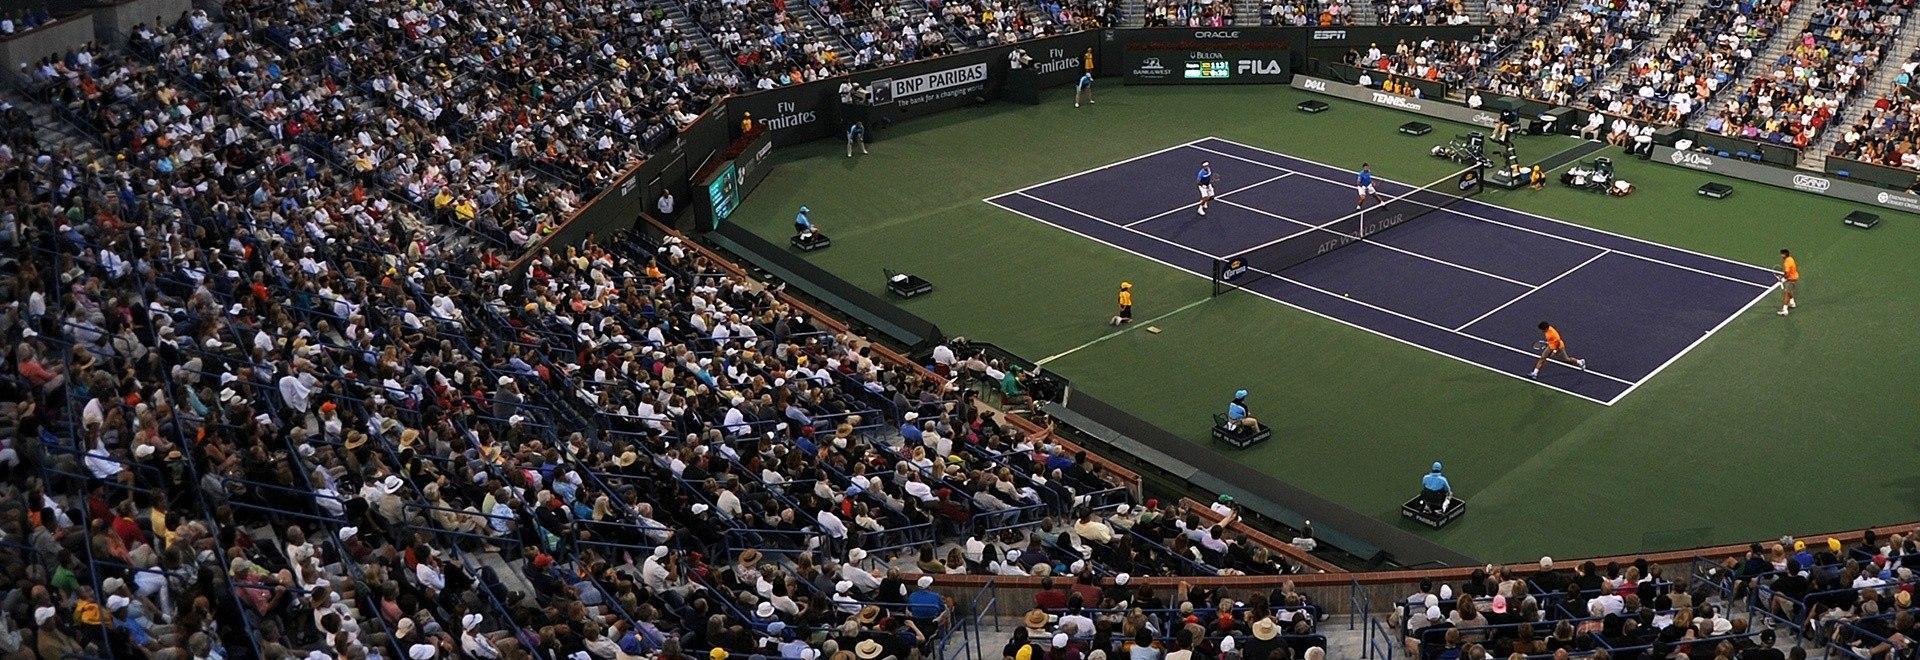 Federer - Wawrinka